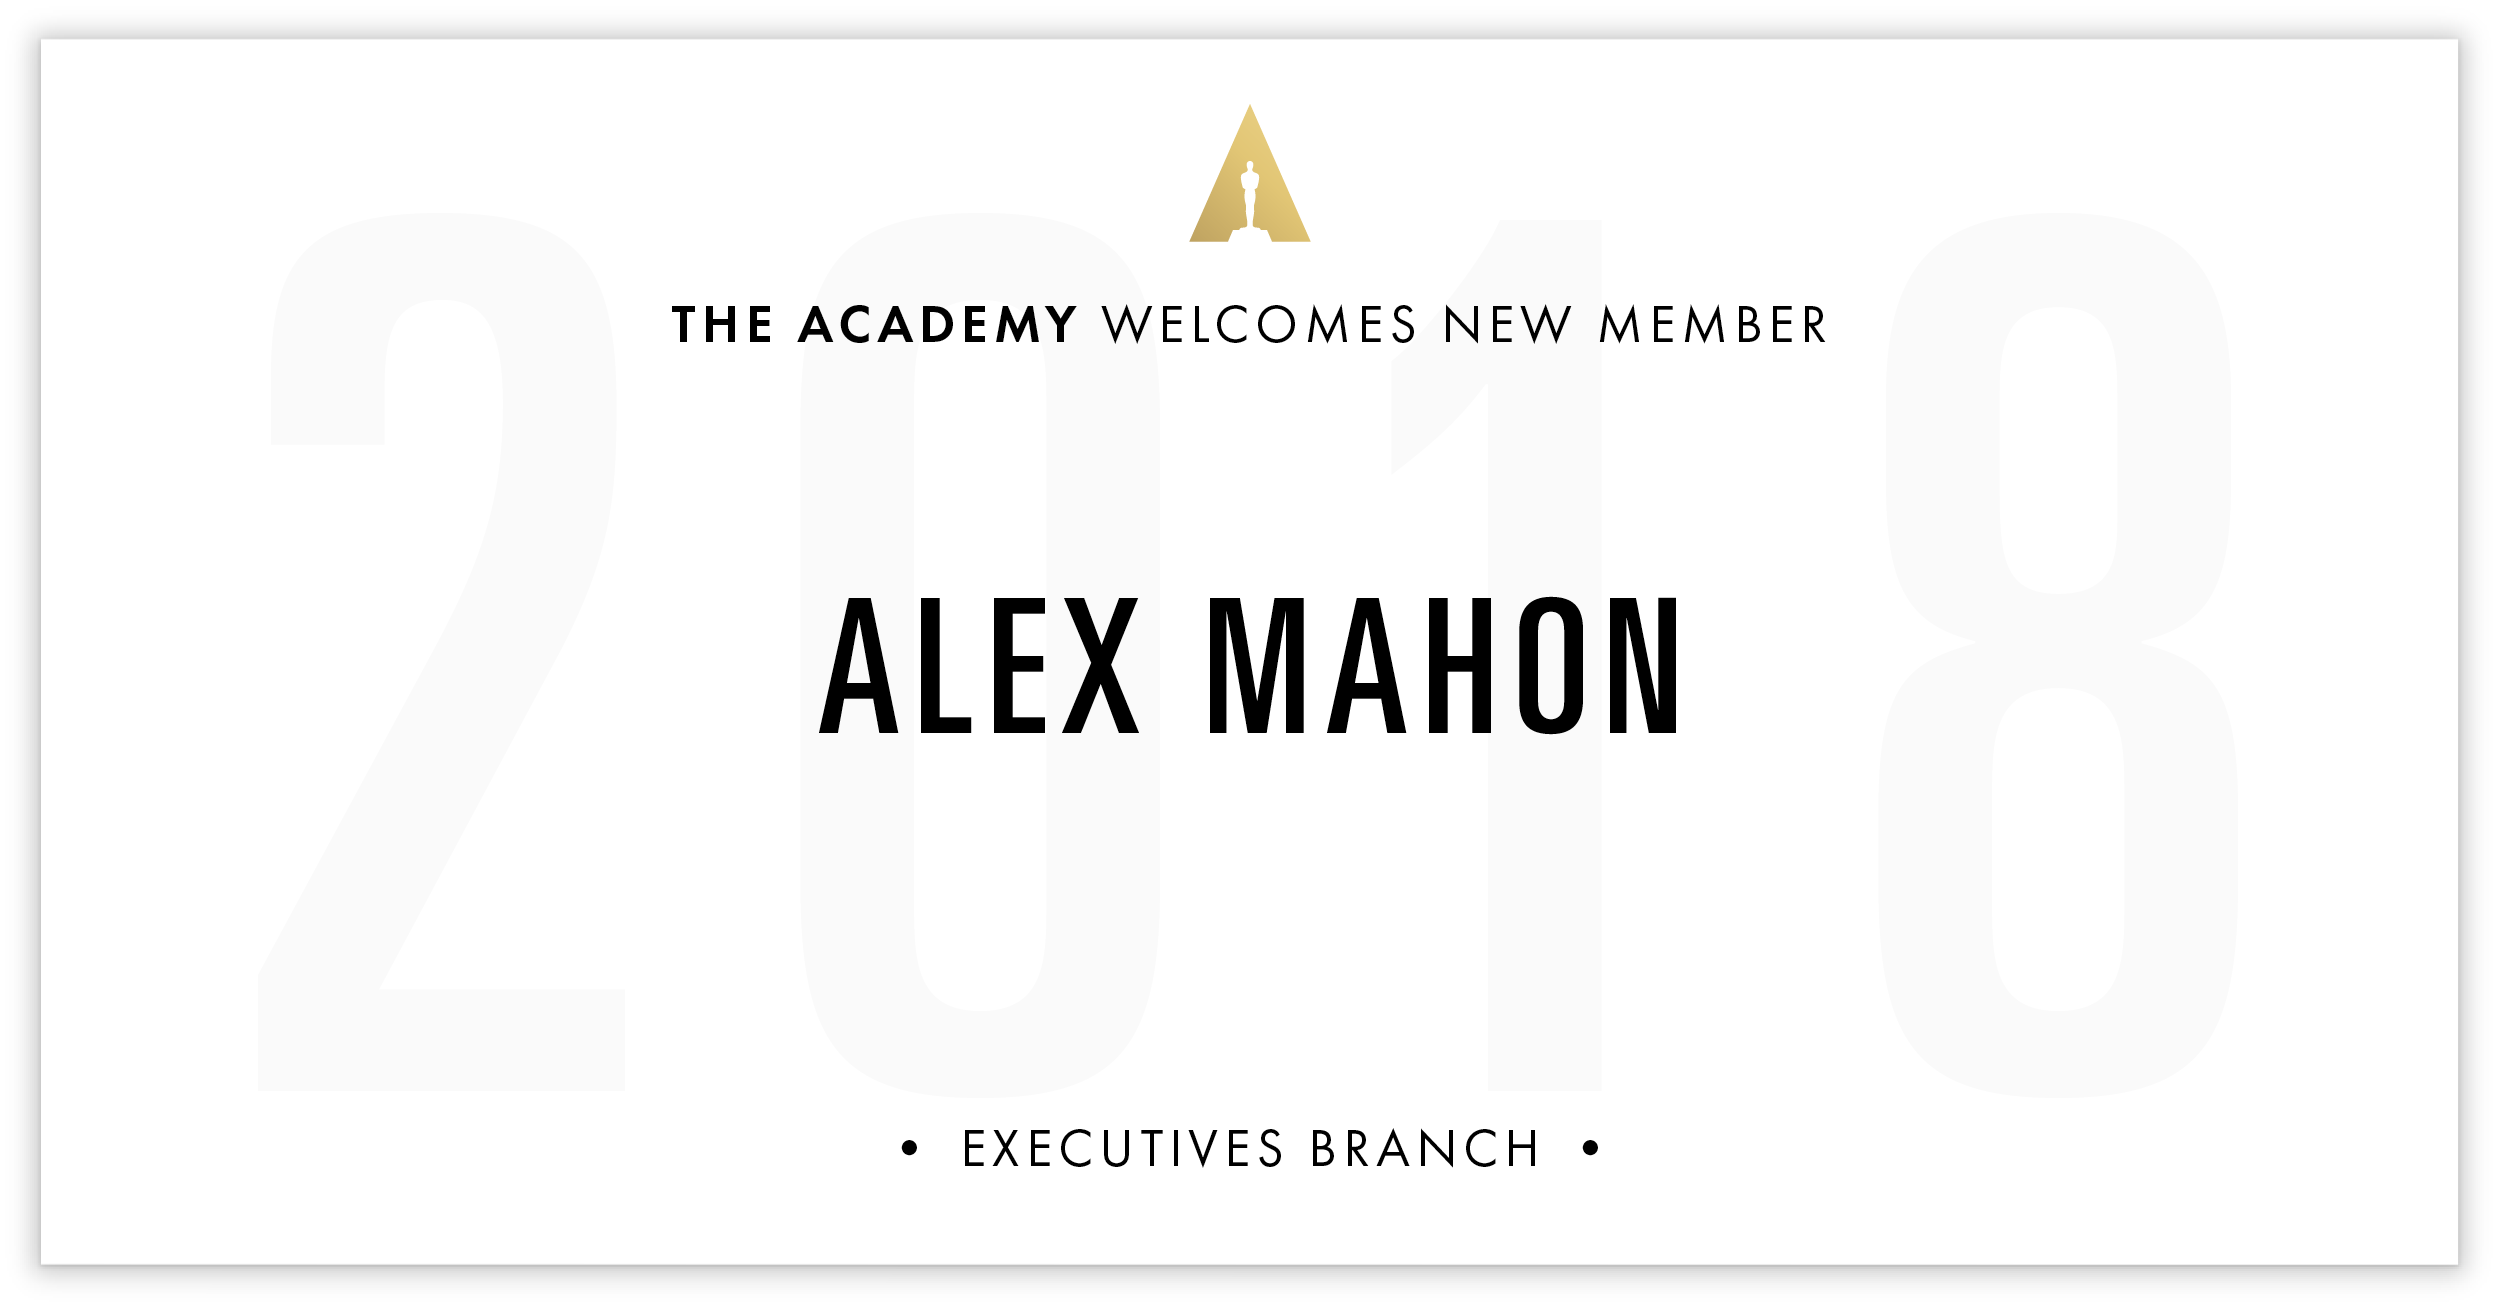 Alex Mahon is invited!